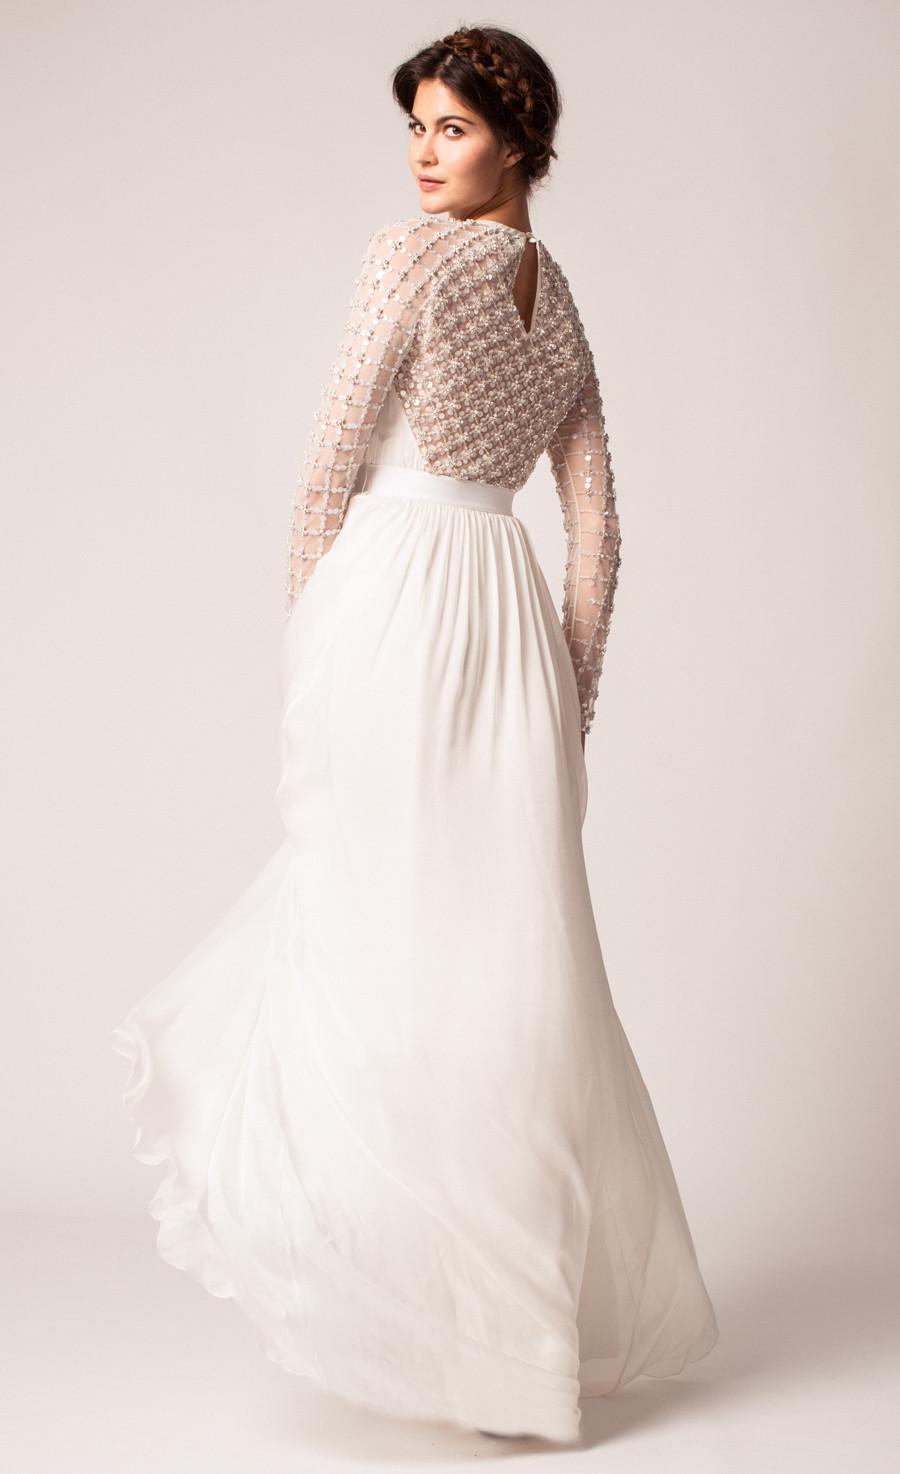 _38_angeli-lattice-dress.jpg